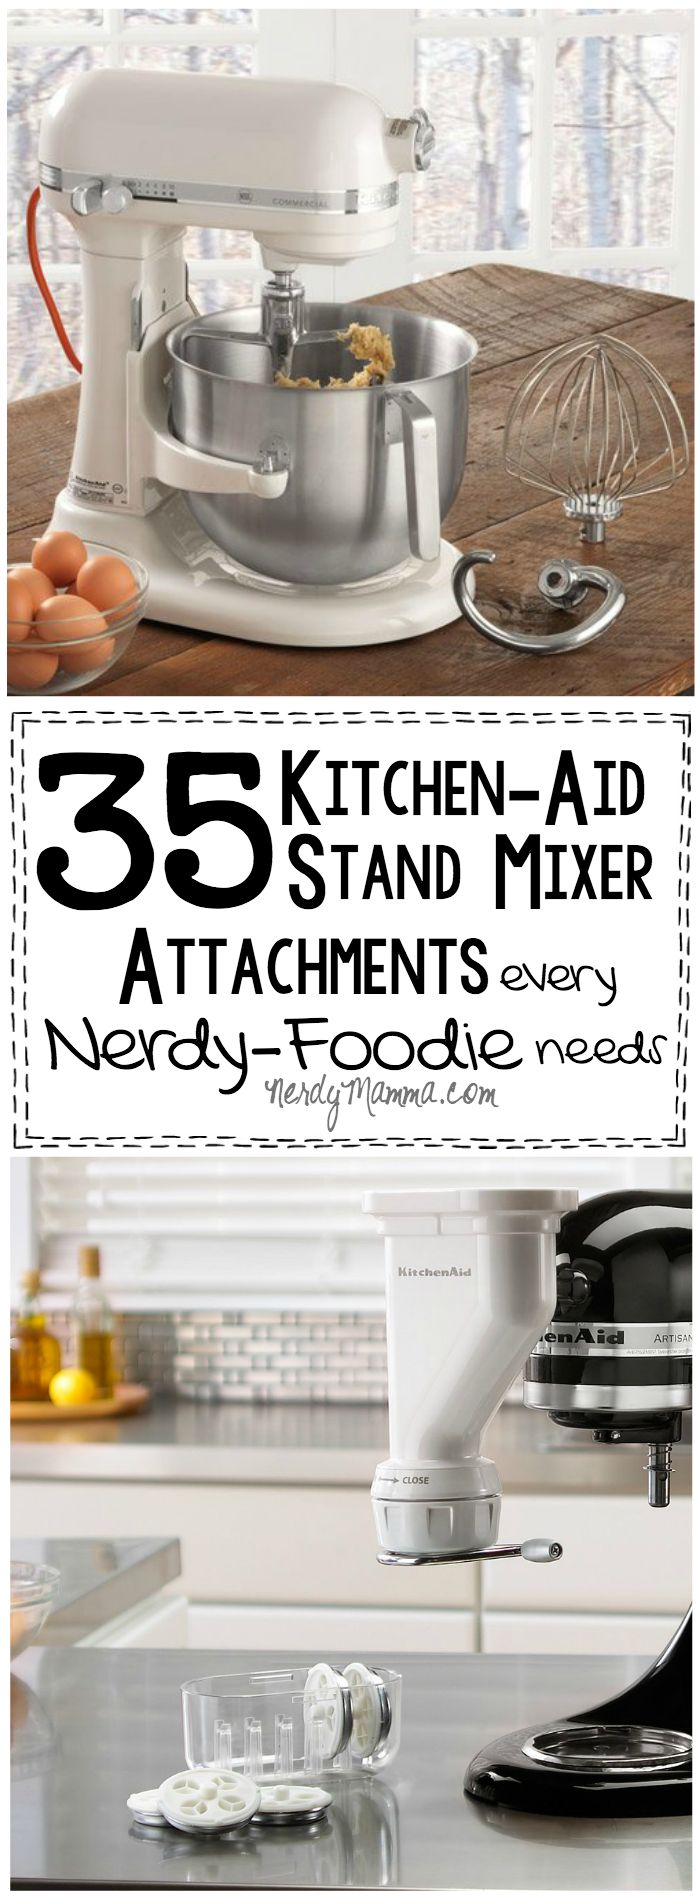 Quilted Kitchen Appliance Covers 17 Best Ideas About Kitchen Mixer 2017 On Pinterest Kitchen